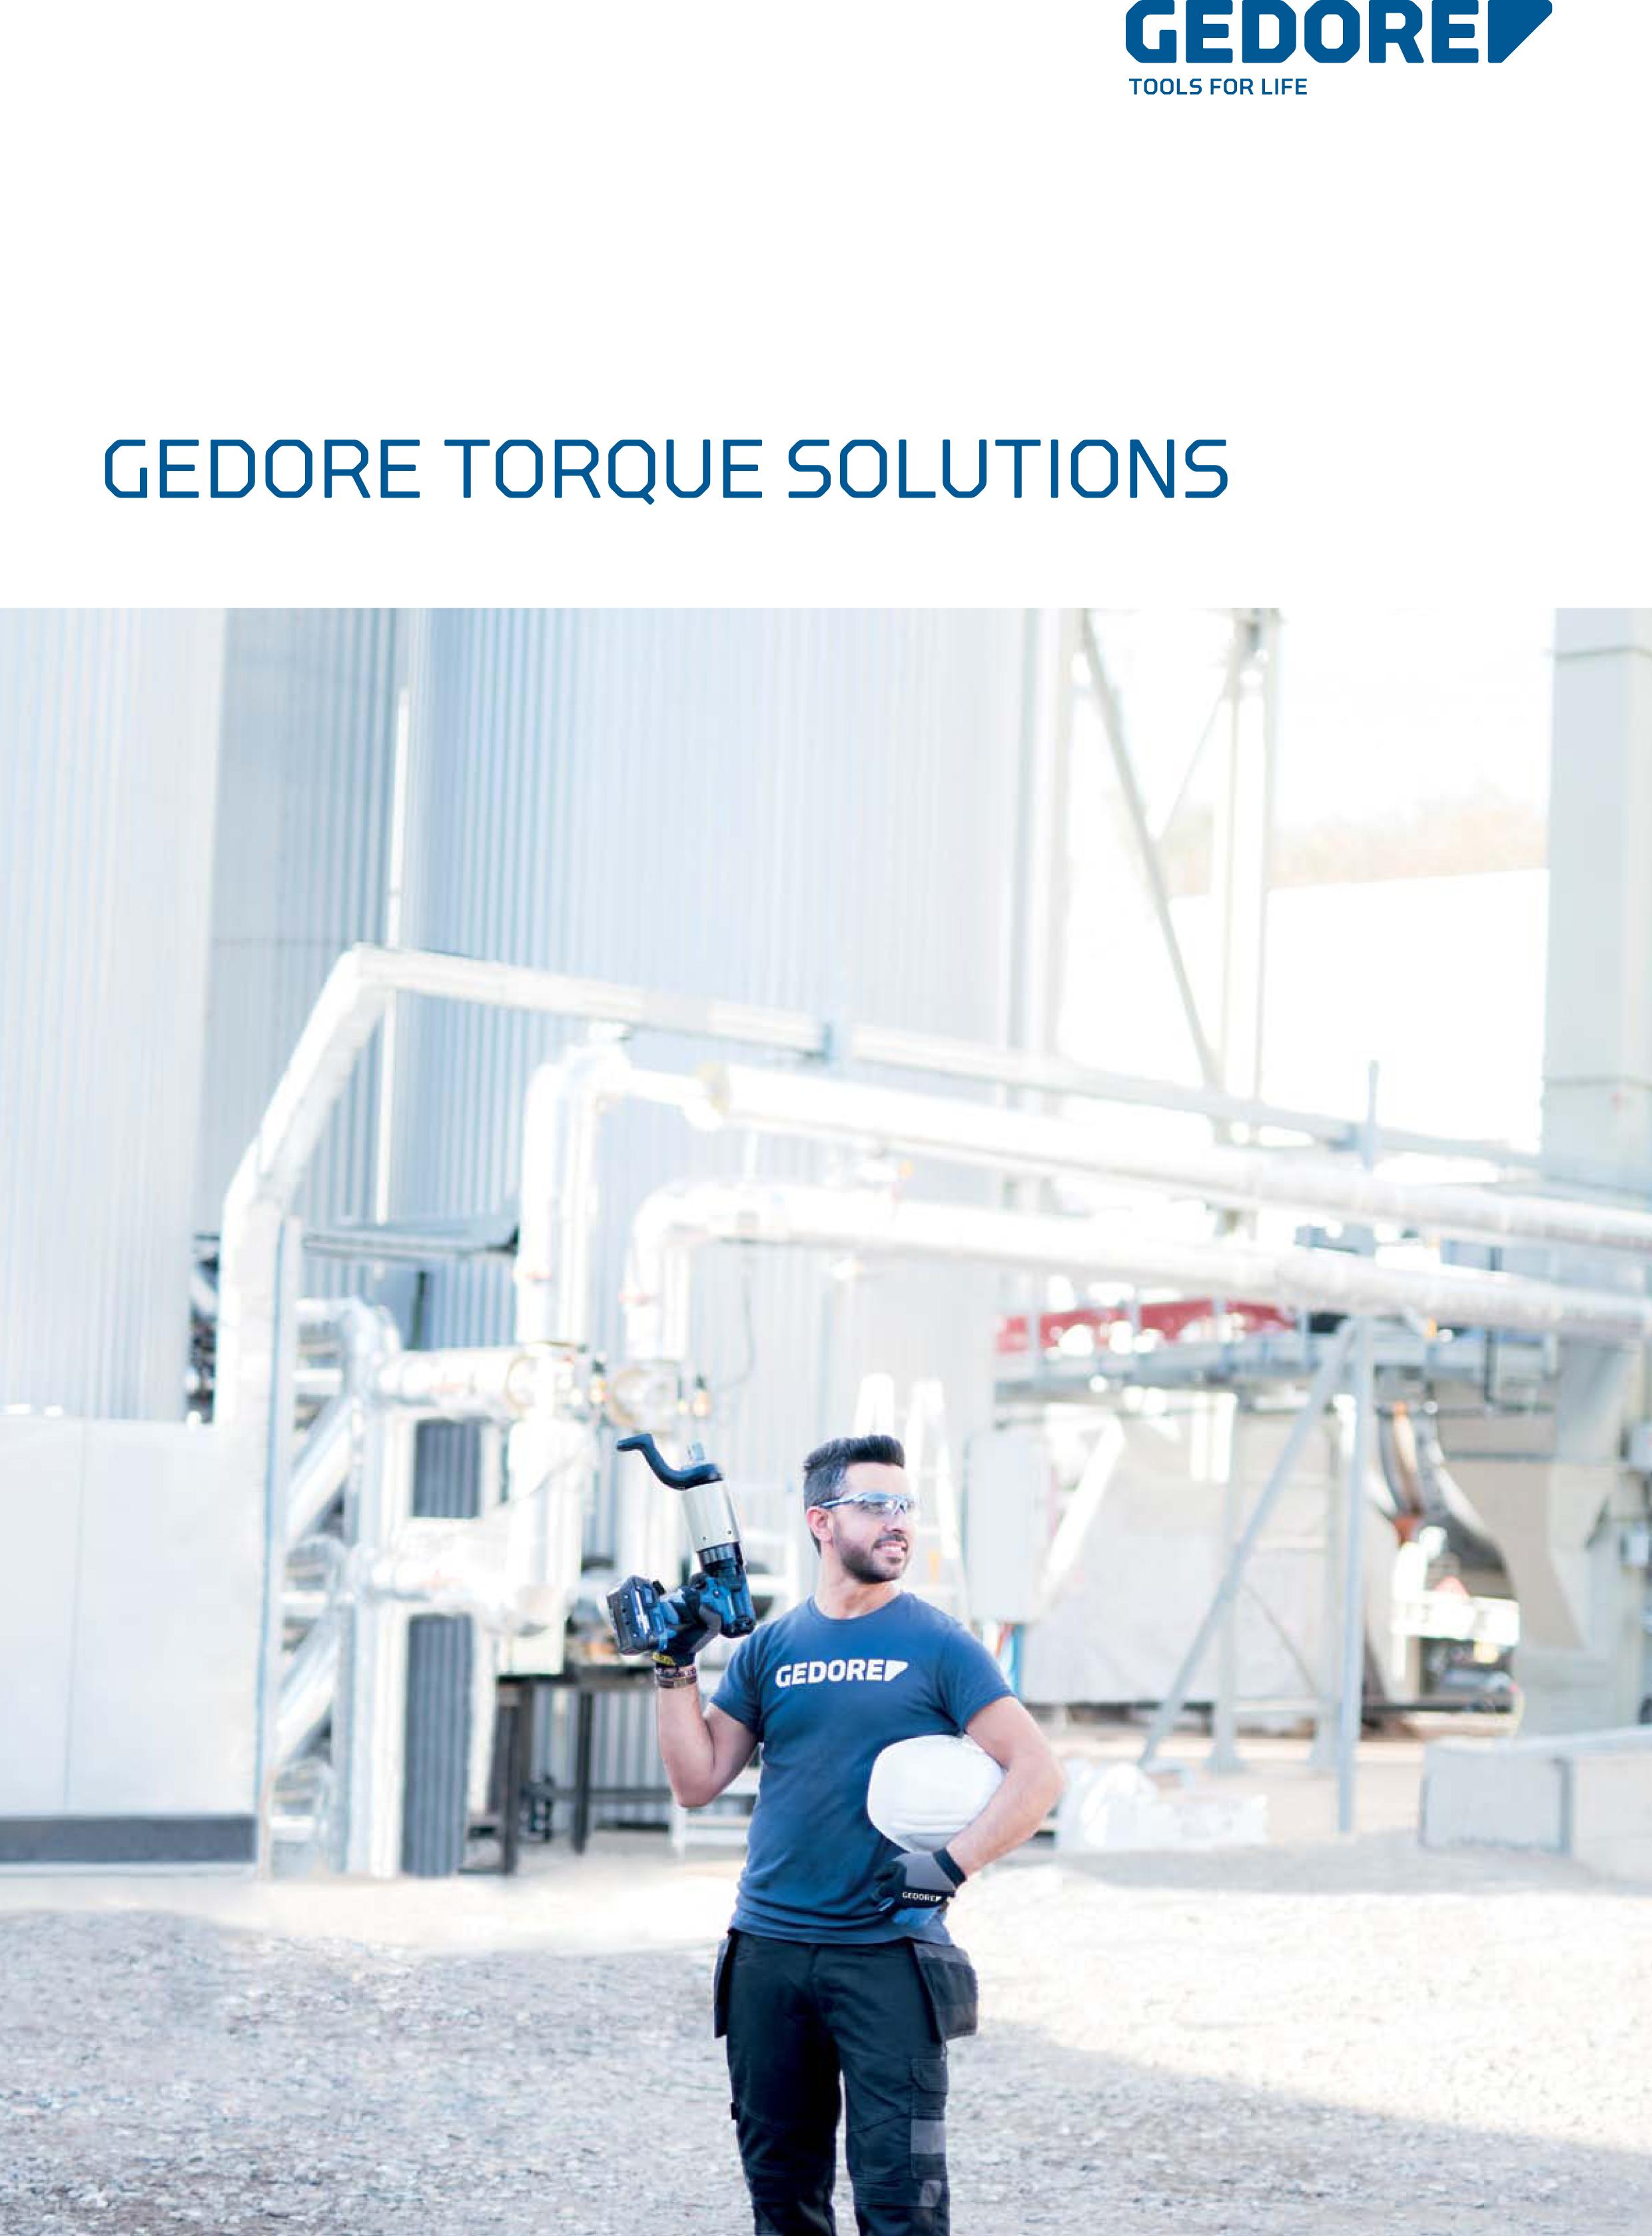 GEDORE Torque Solutions 2018/2017